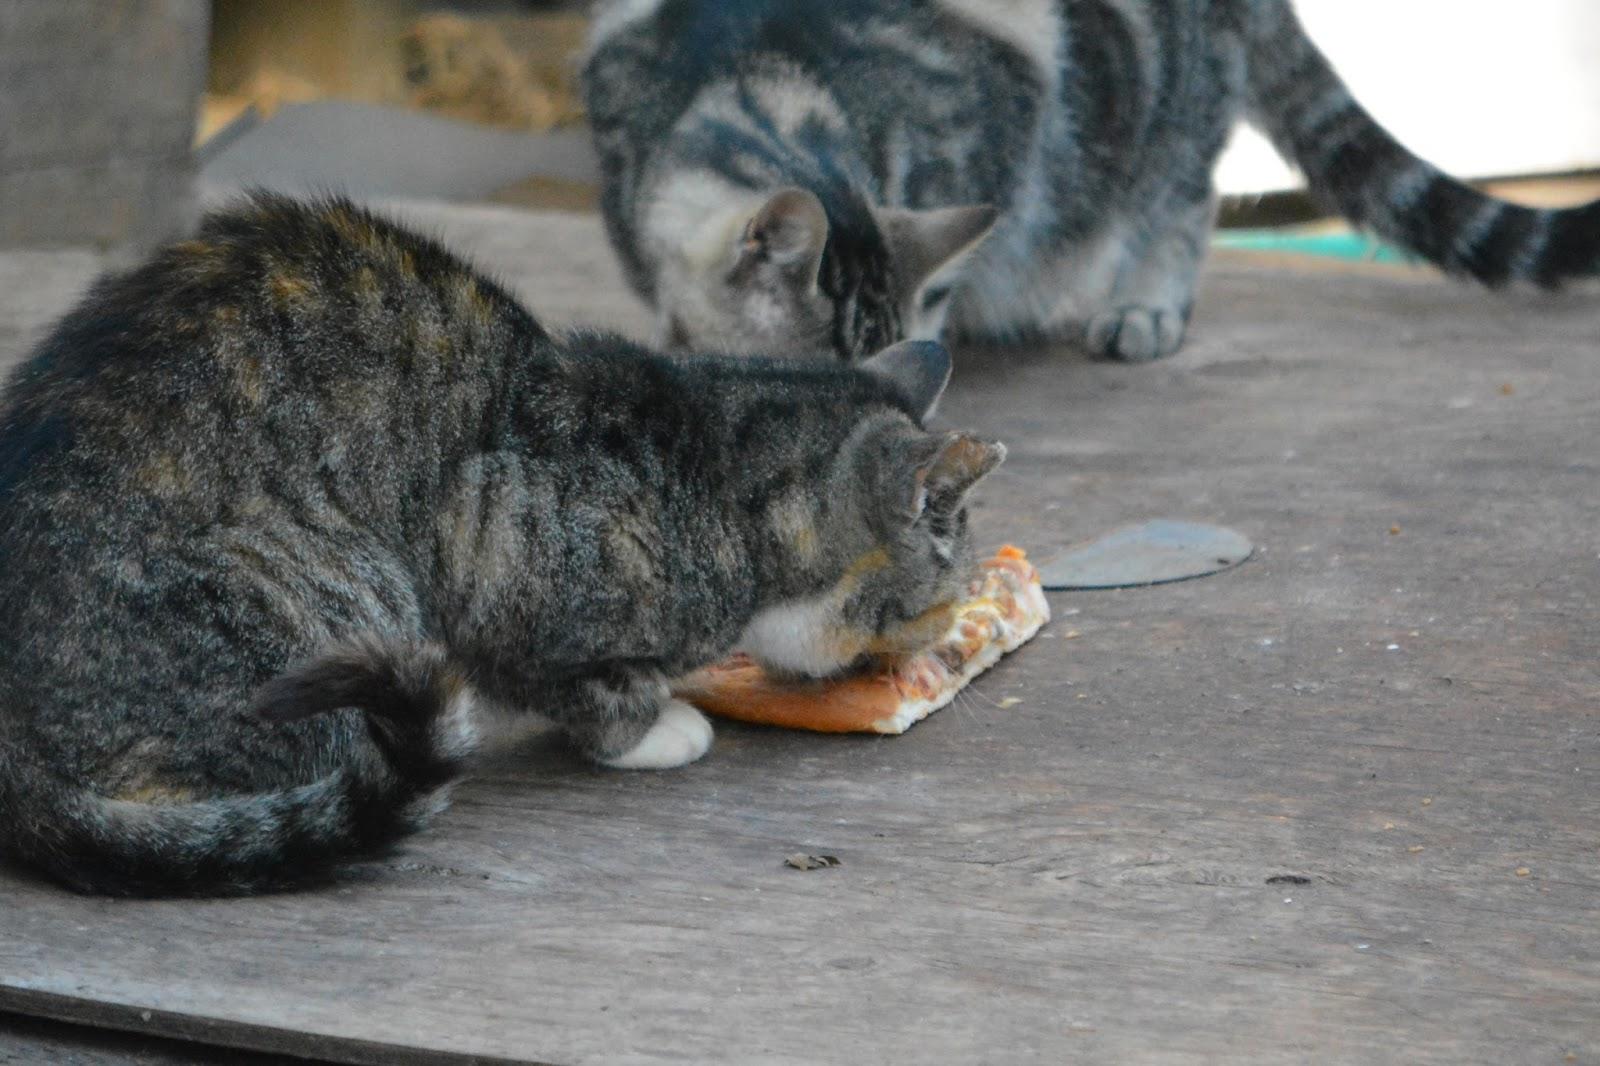 soft e collar for cats